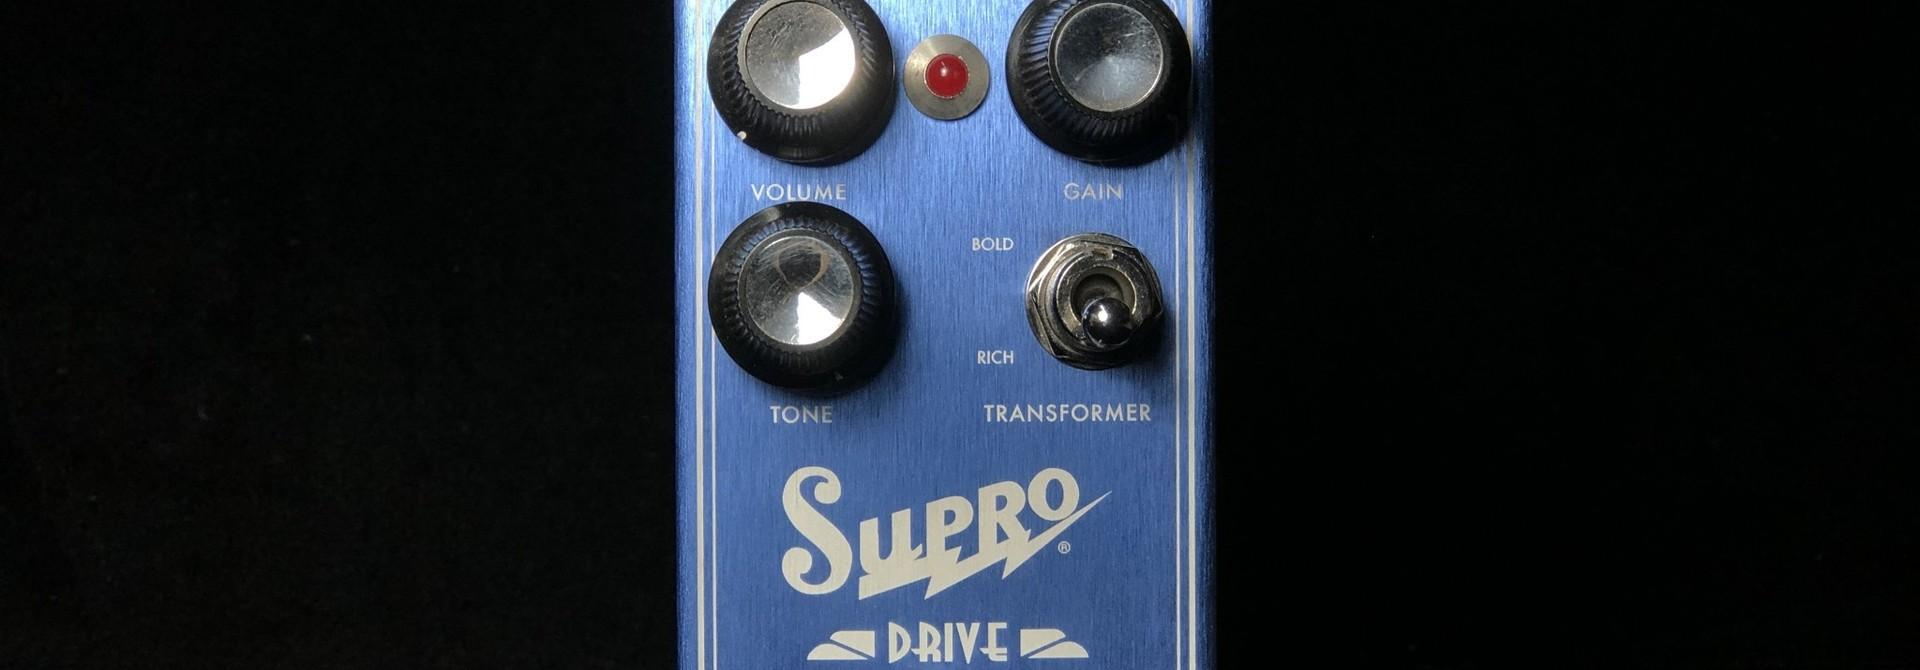 Supro Drive